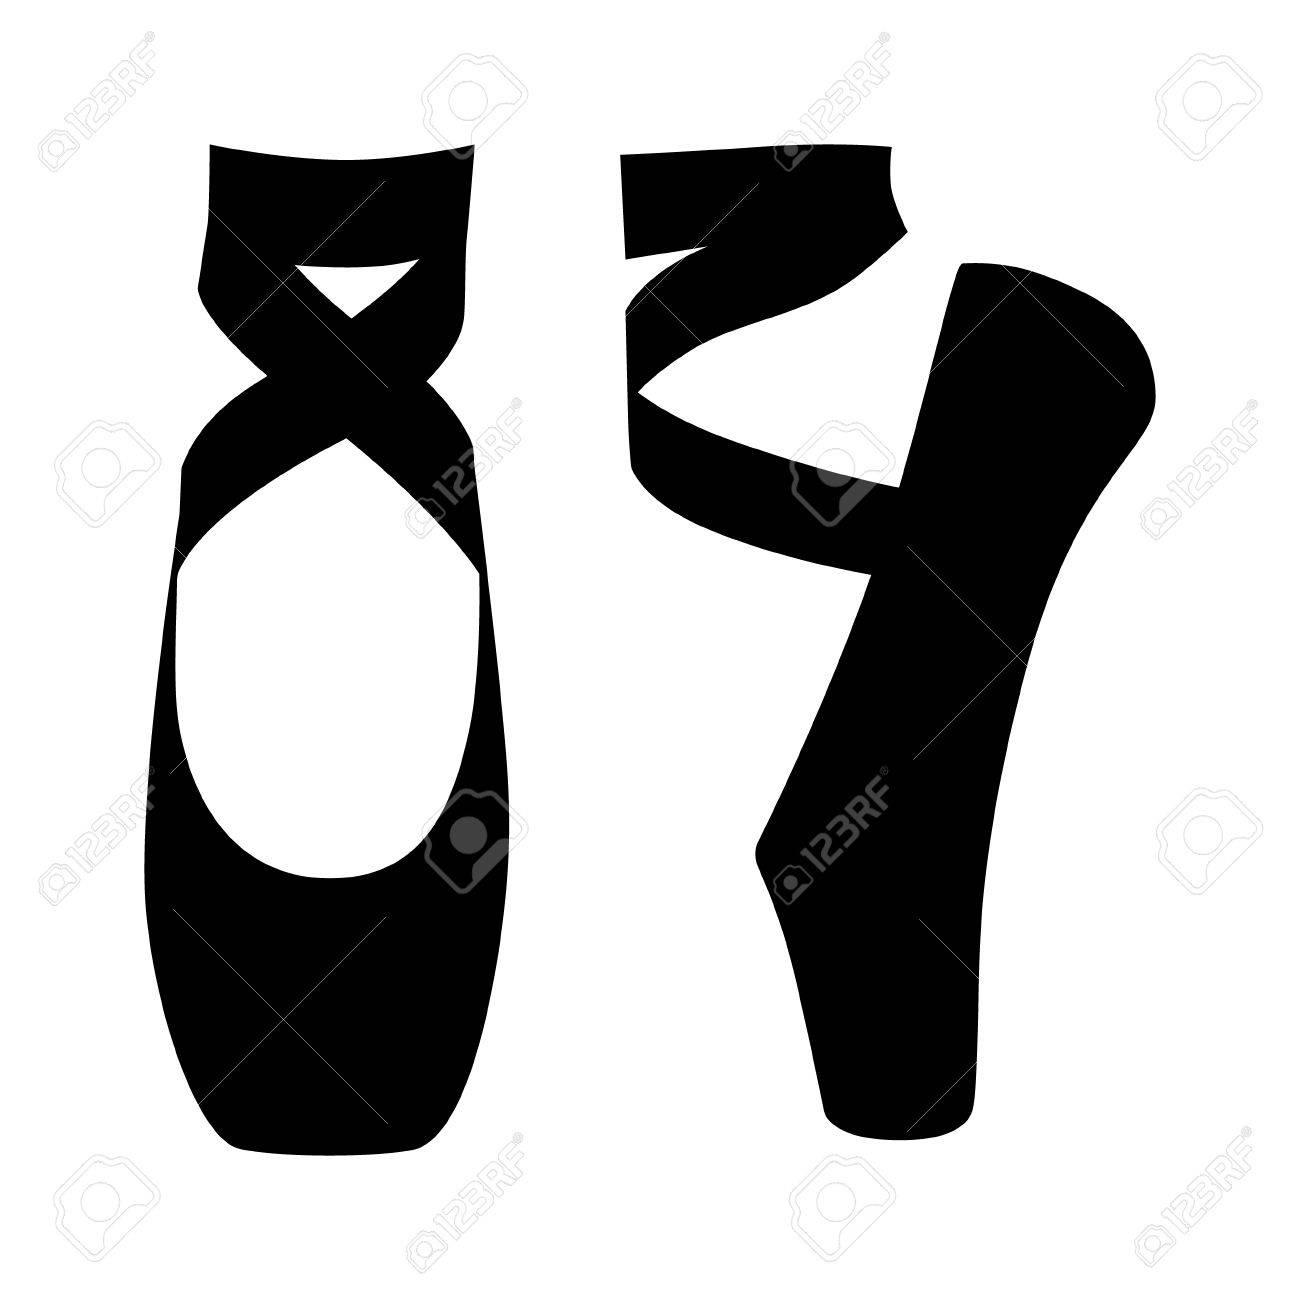 Ballet dance / dancing shoes or slippers in en pointe position